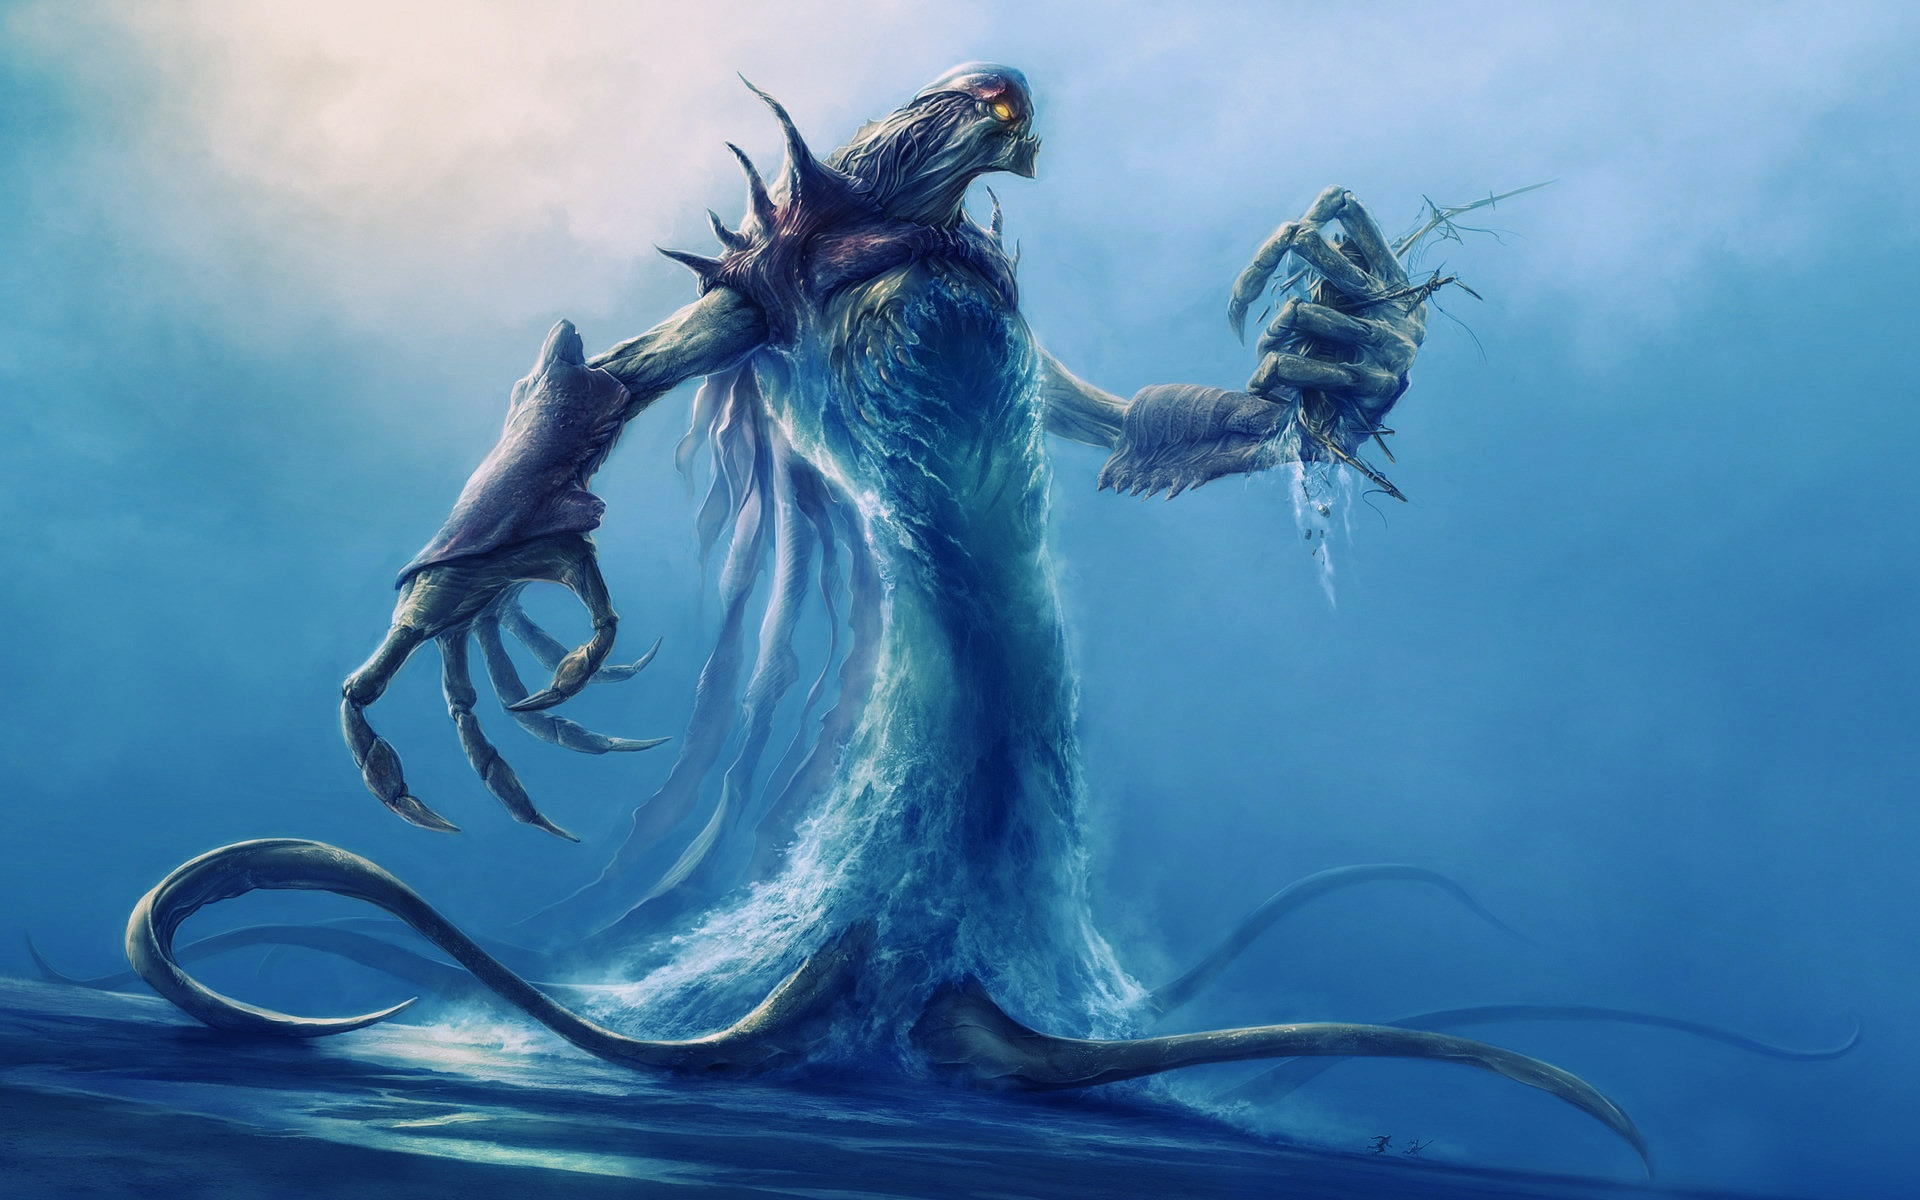 Giant sea monsters art - photo#40